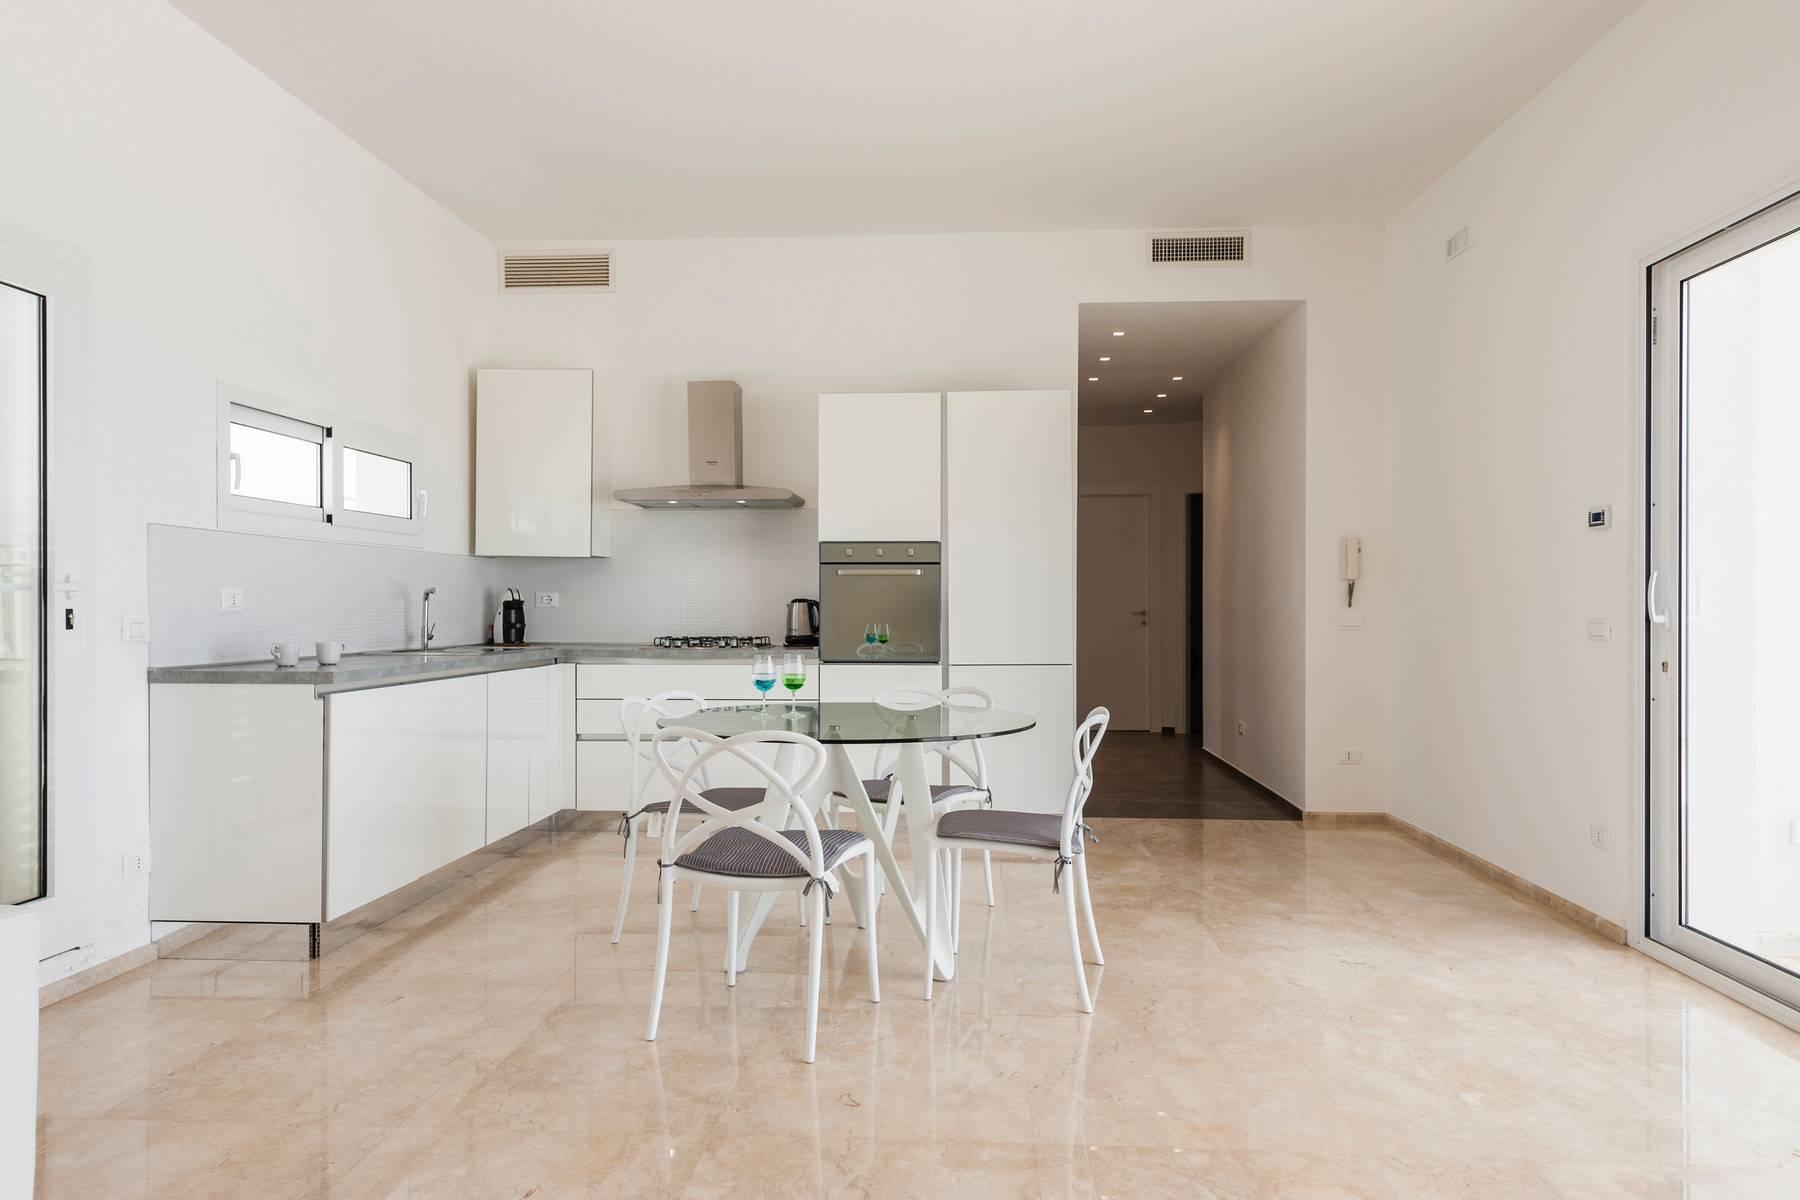 Casa indipendente in Vendita a Avola: 5 locali, 131 mq - Foto 15